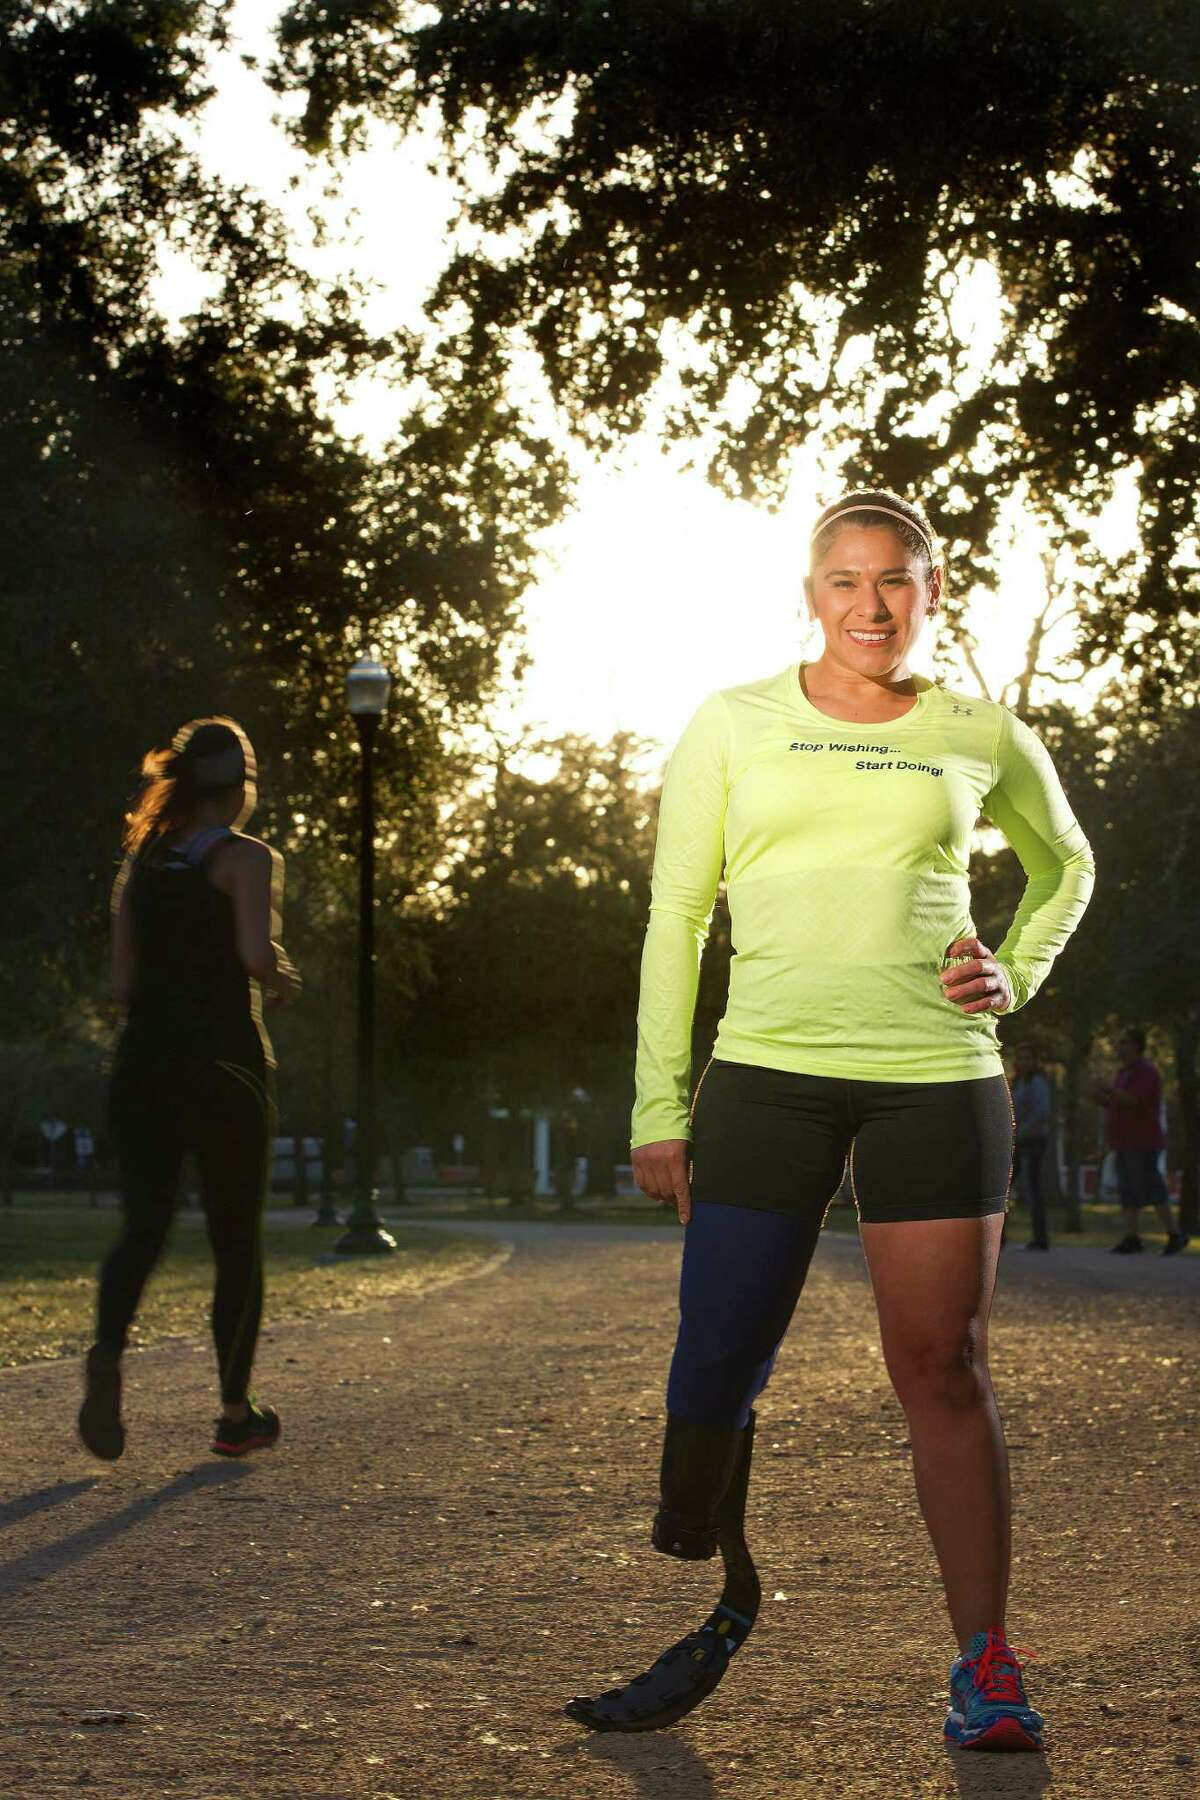 The Chevron Houston Marathon on Sunday will be Alma Faz's first crack at the 26.2-mile distance.